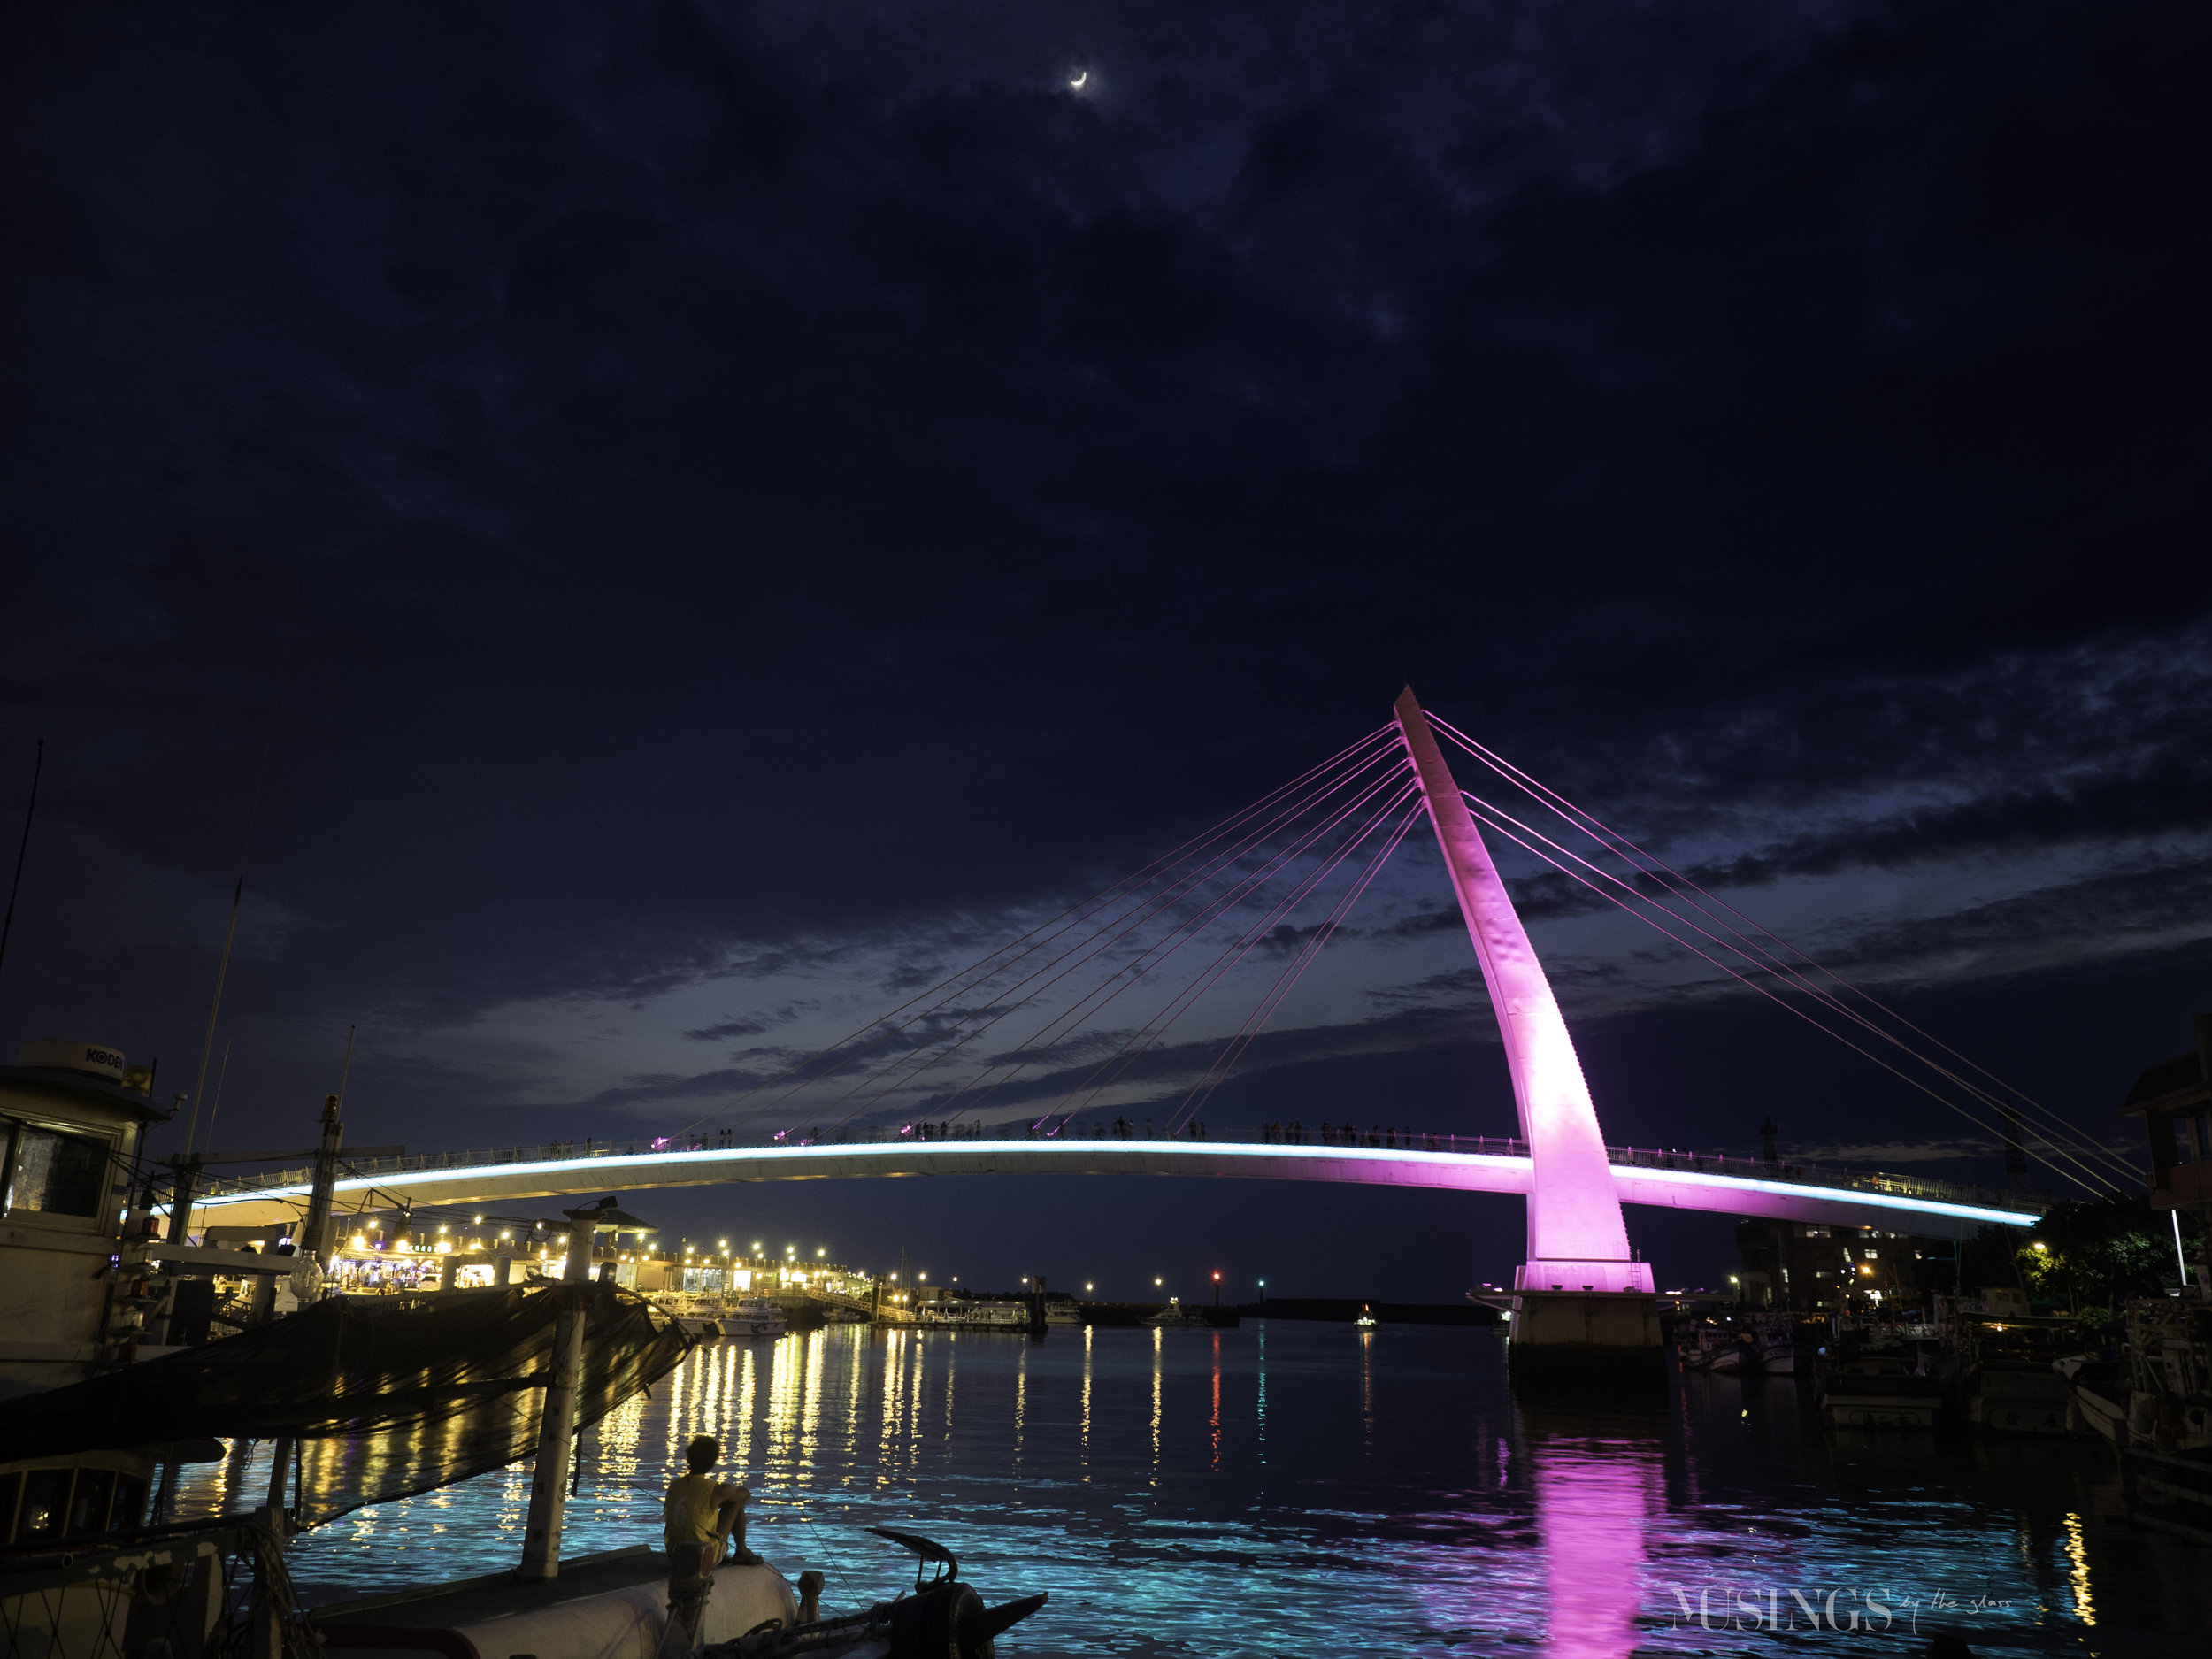 Gazing at Lover's Bridge